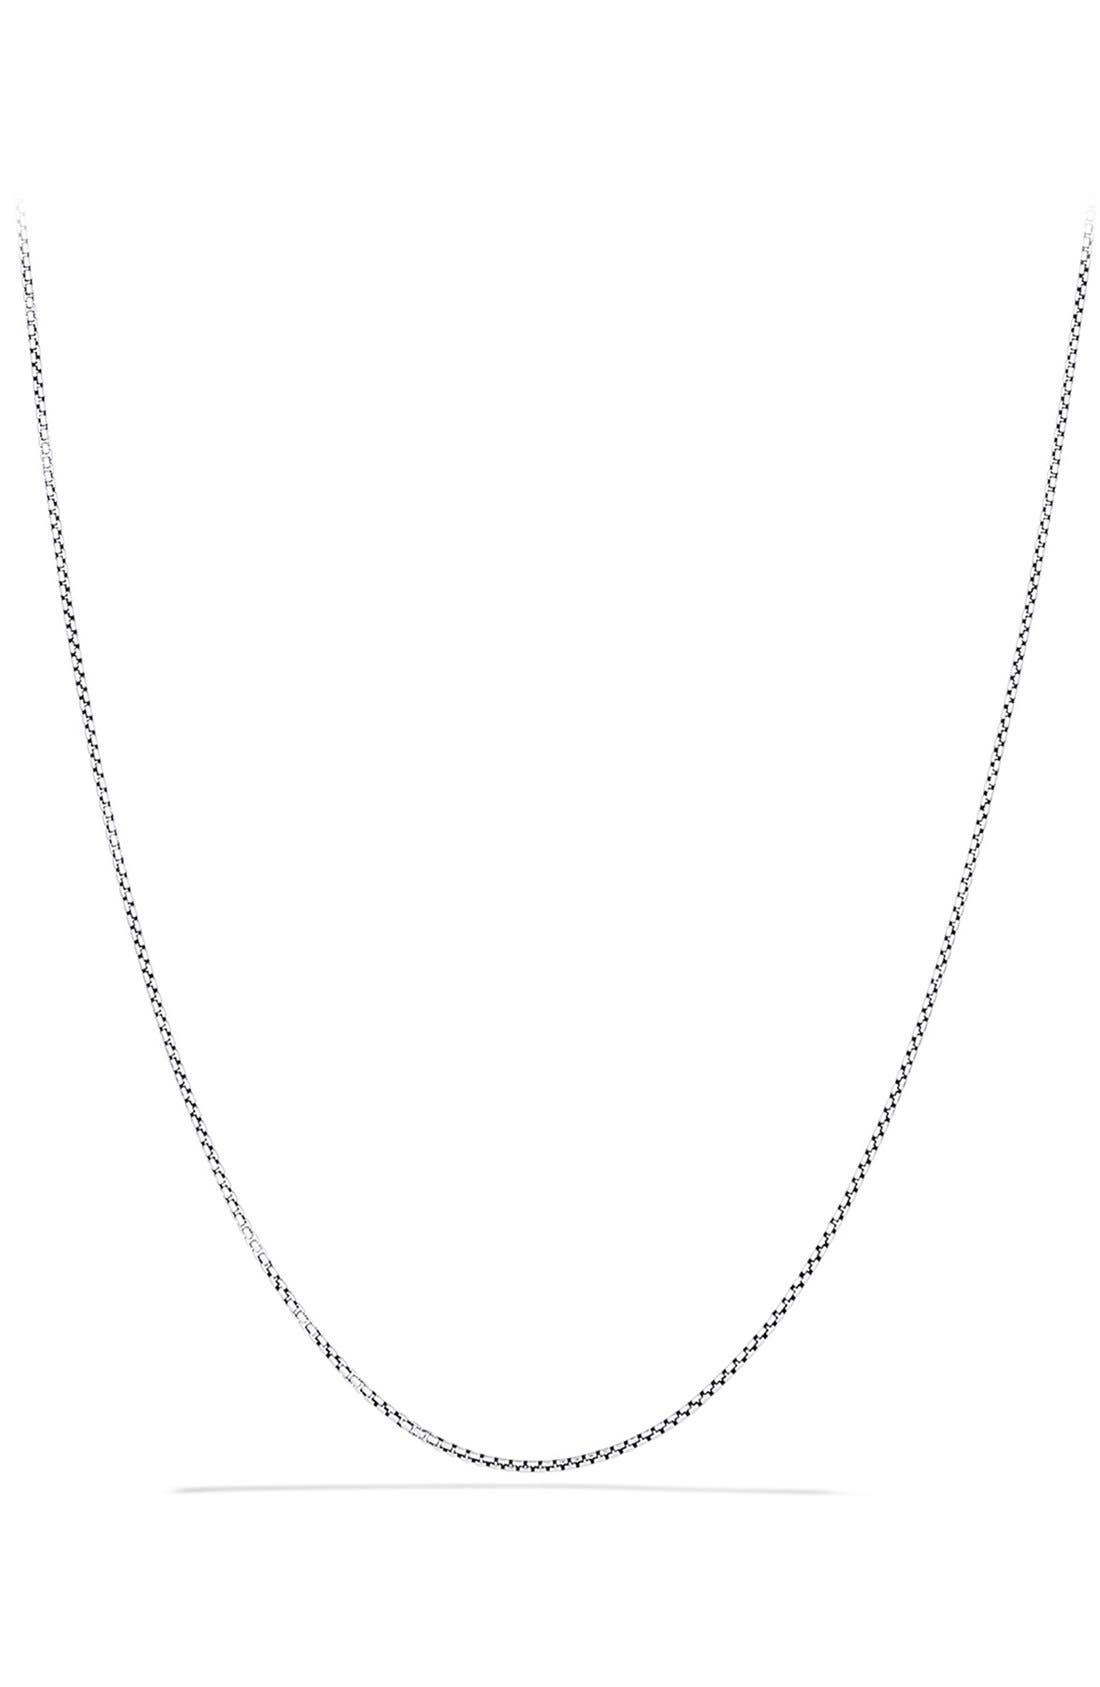 Main Image - David Yurman 'Chain' Baby Box Chain Necklace